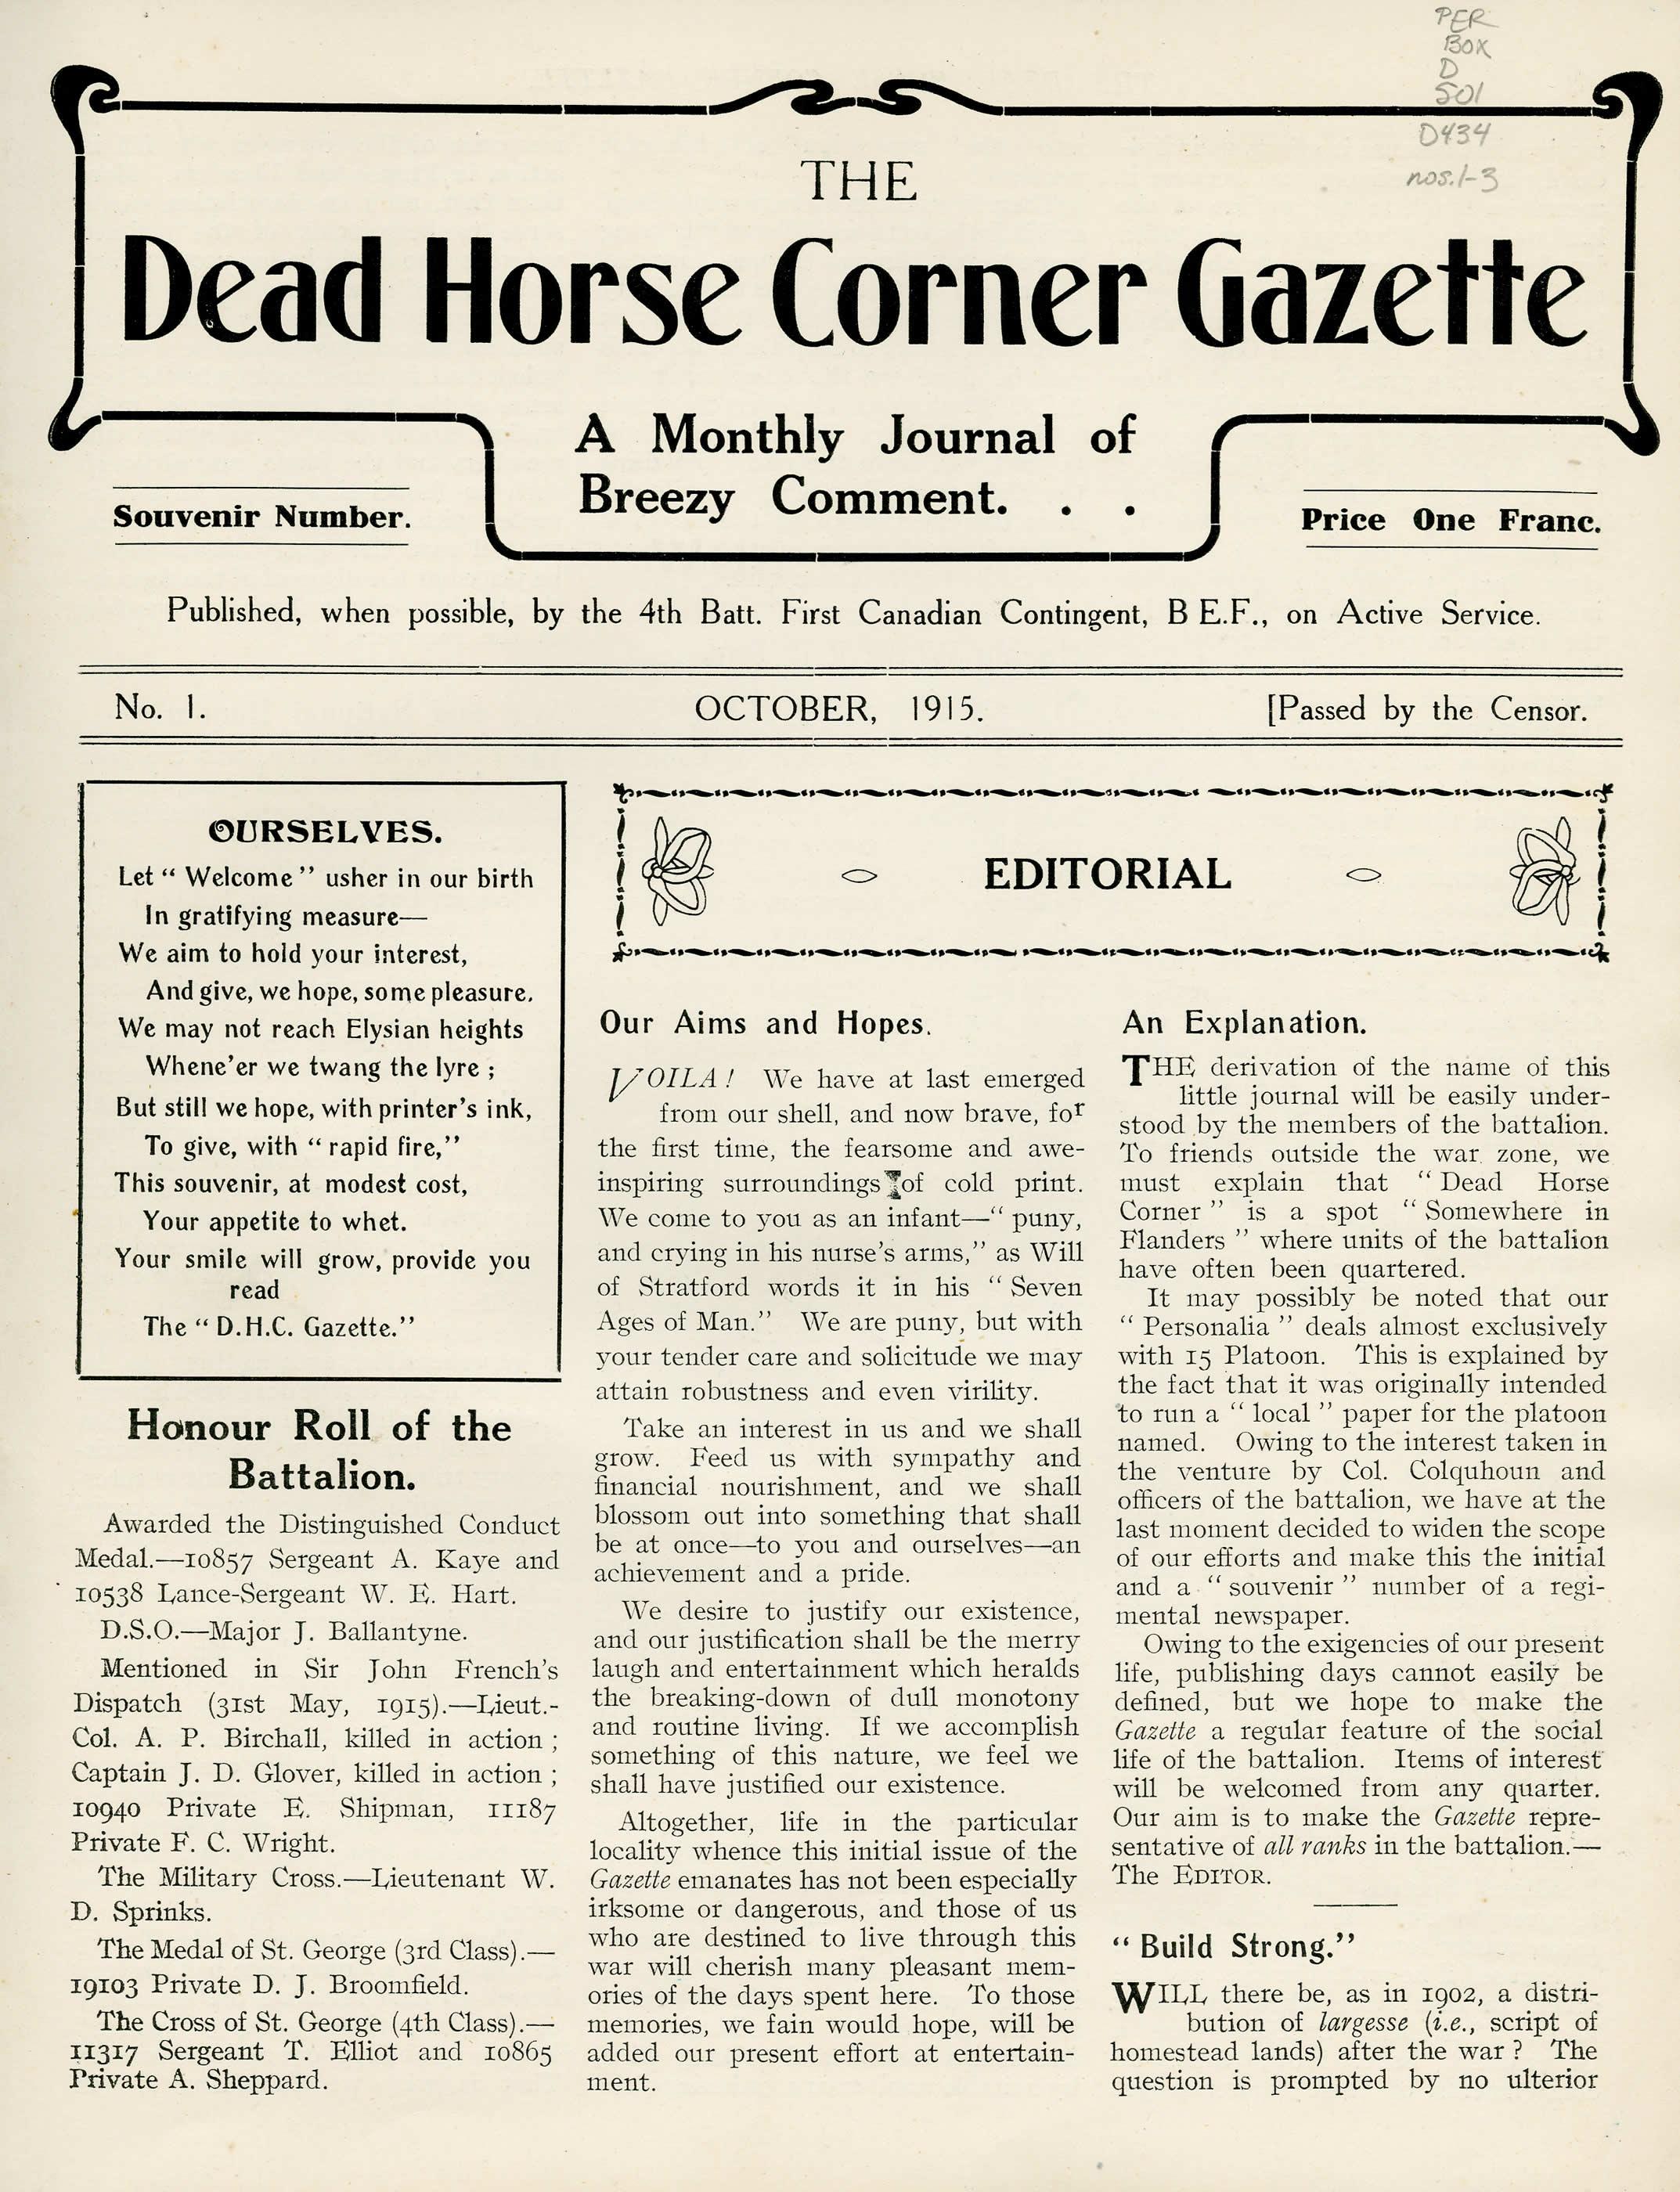 The Dead Horse Corner Gazette